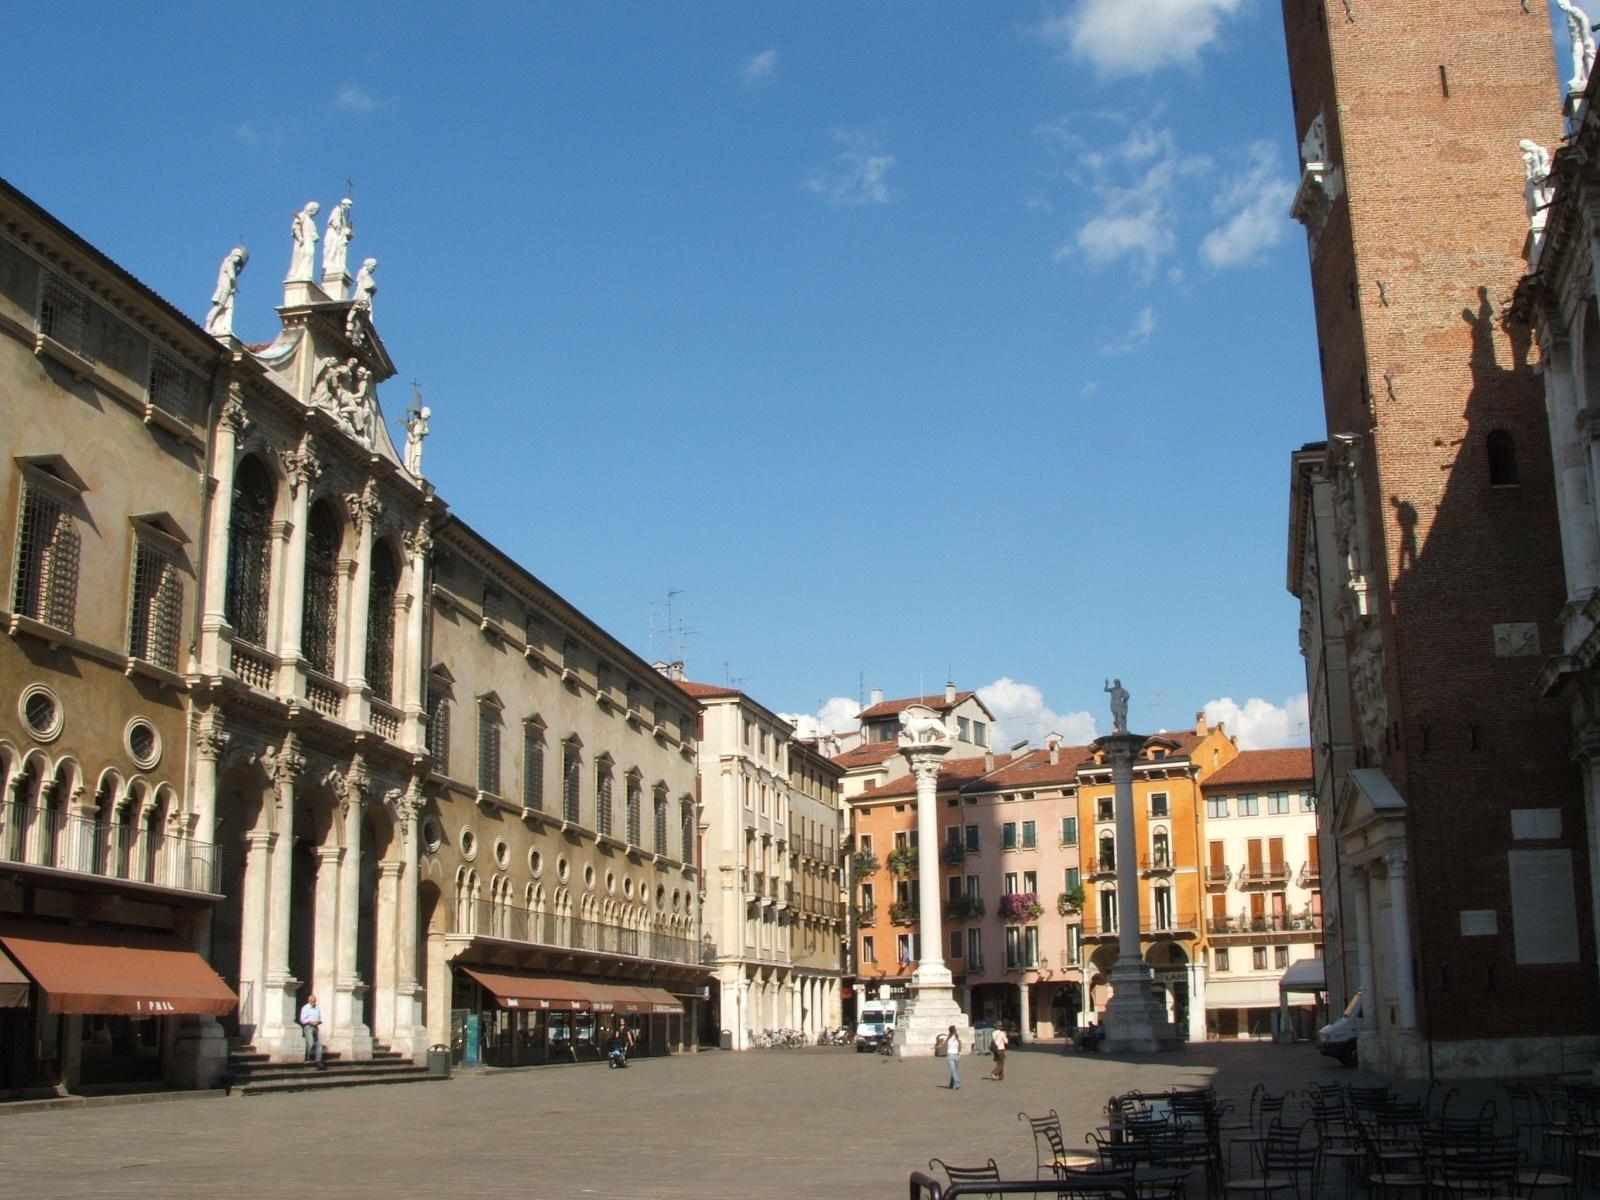 Vicenza Italy  City pictures : Piazza dei Signori, Vicenza | Italy | Pinterest